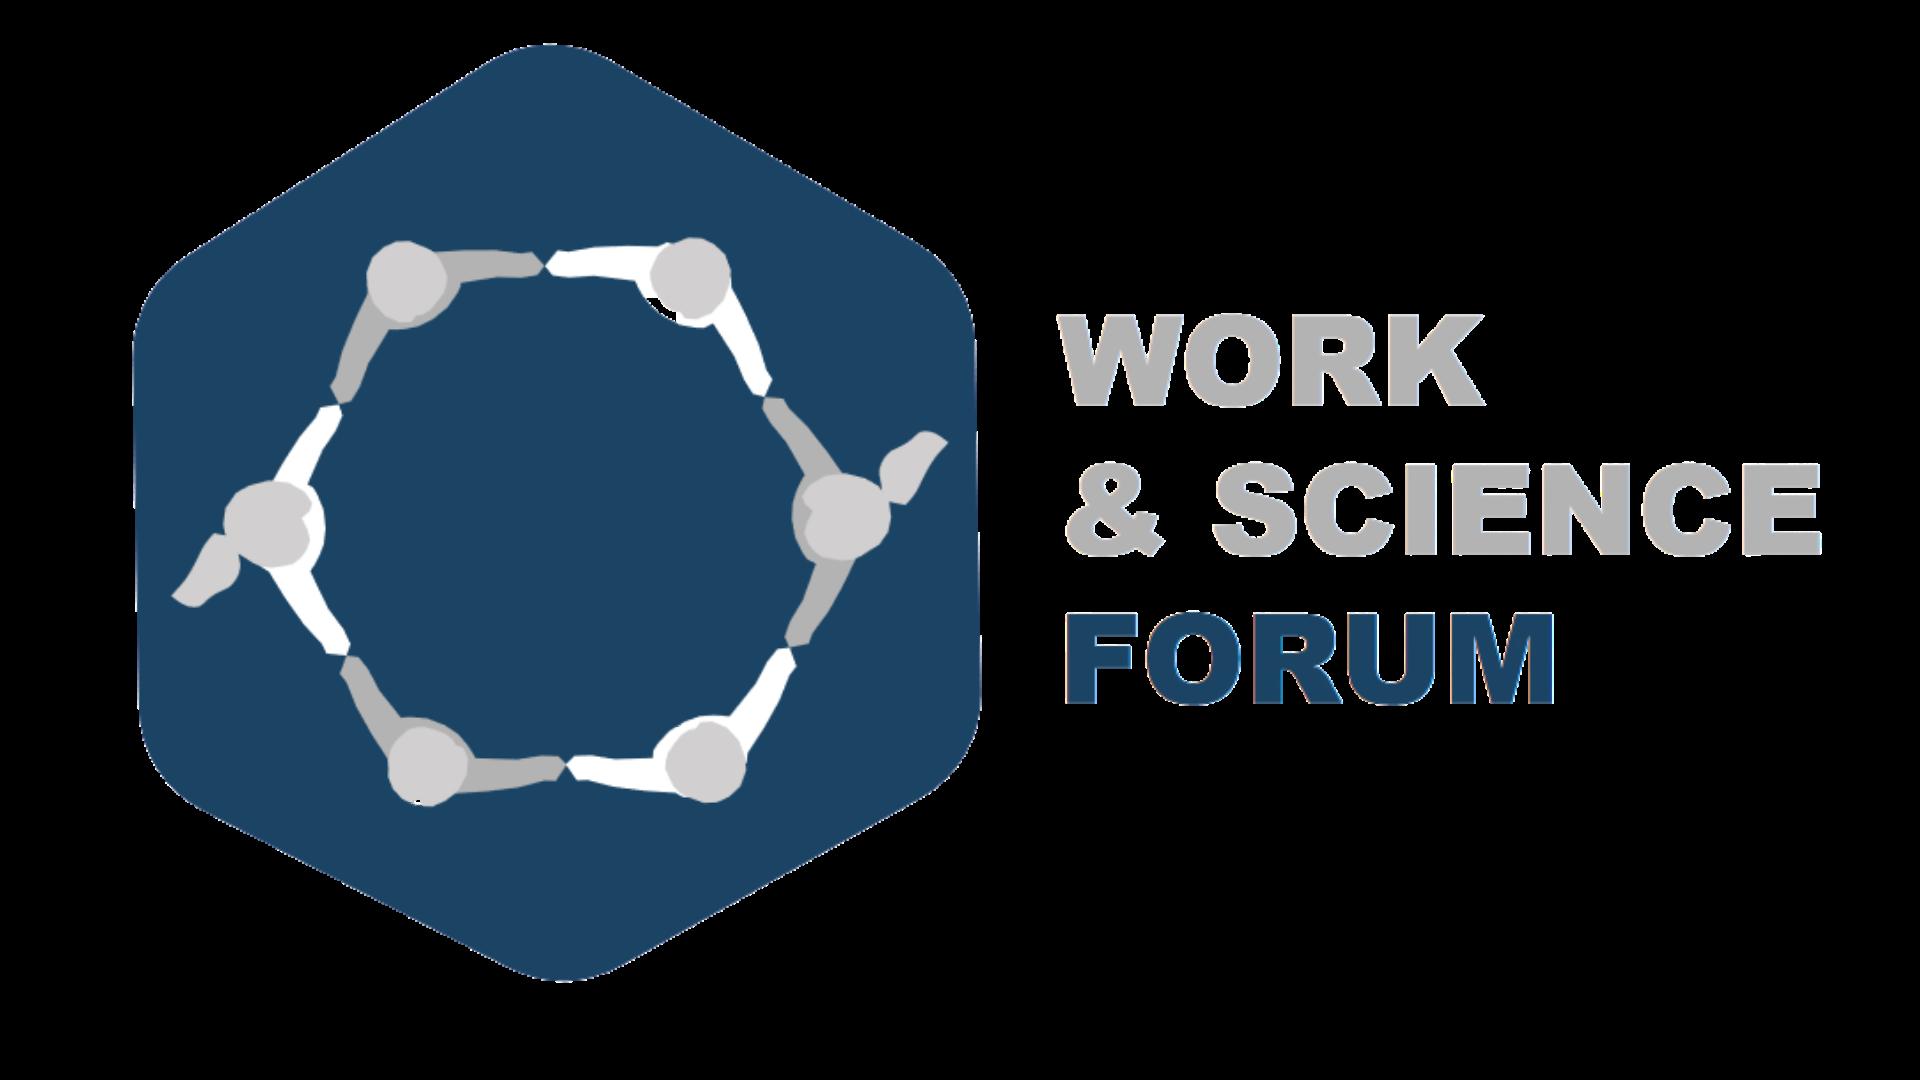 Work&Science Forum